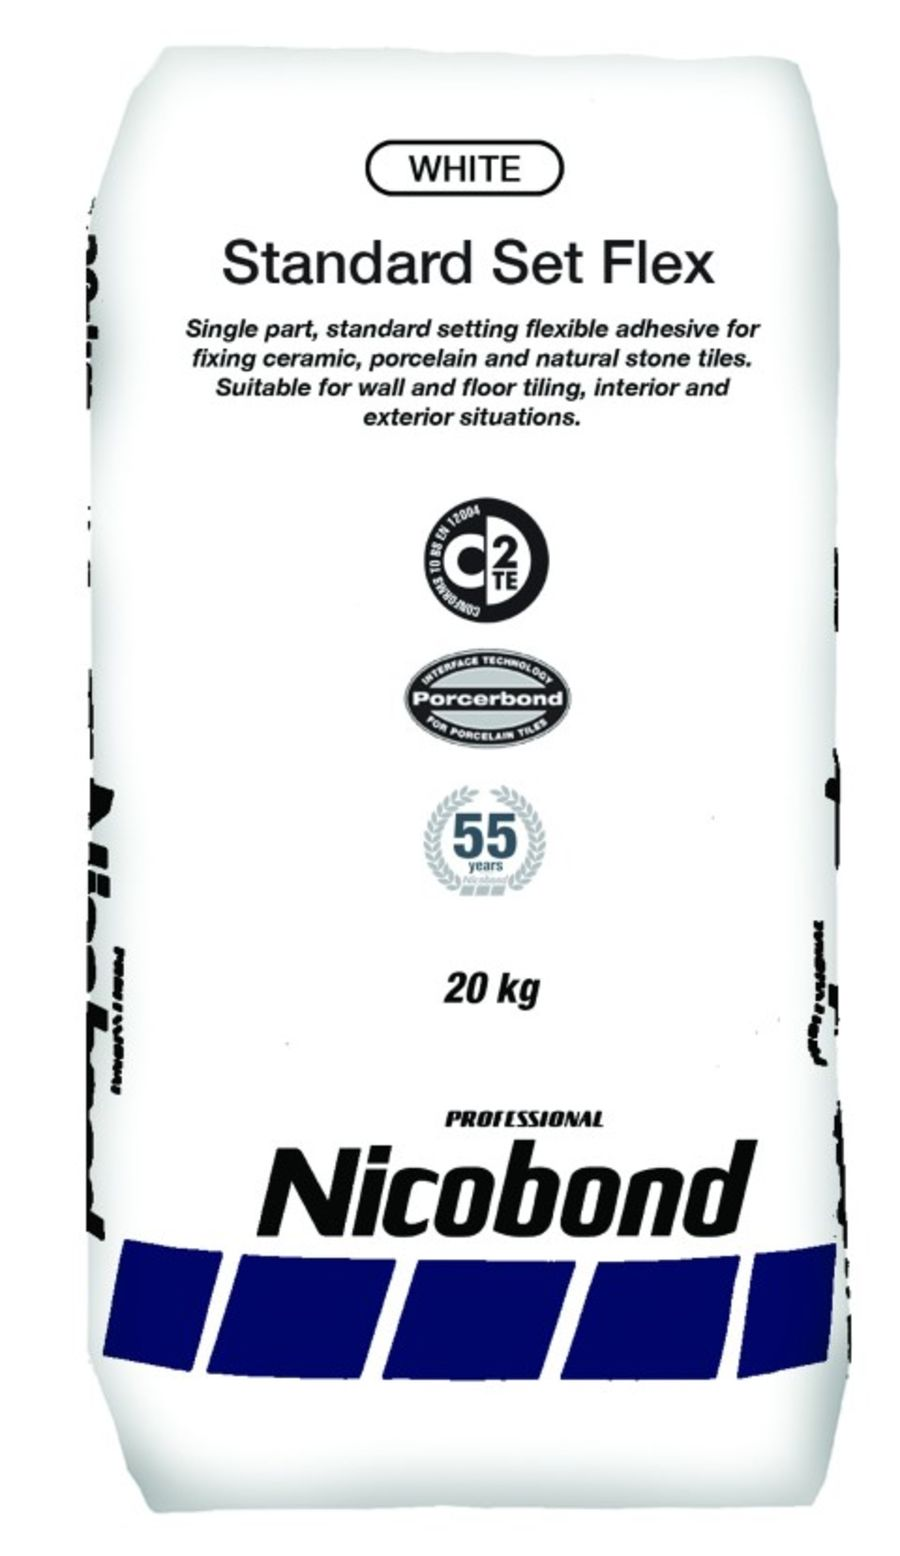 Nicobond Standard Set Flexible Tile Adhesive White 20kg - Pallet Quantity (50 bags)